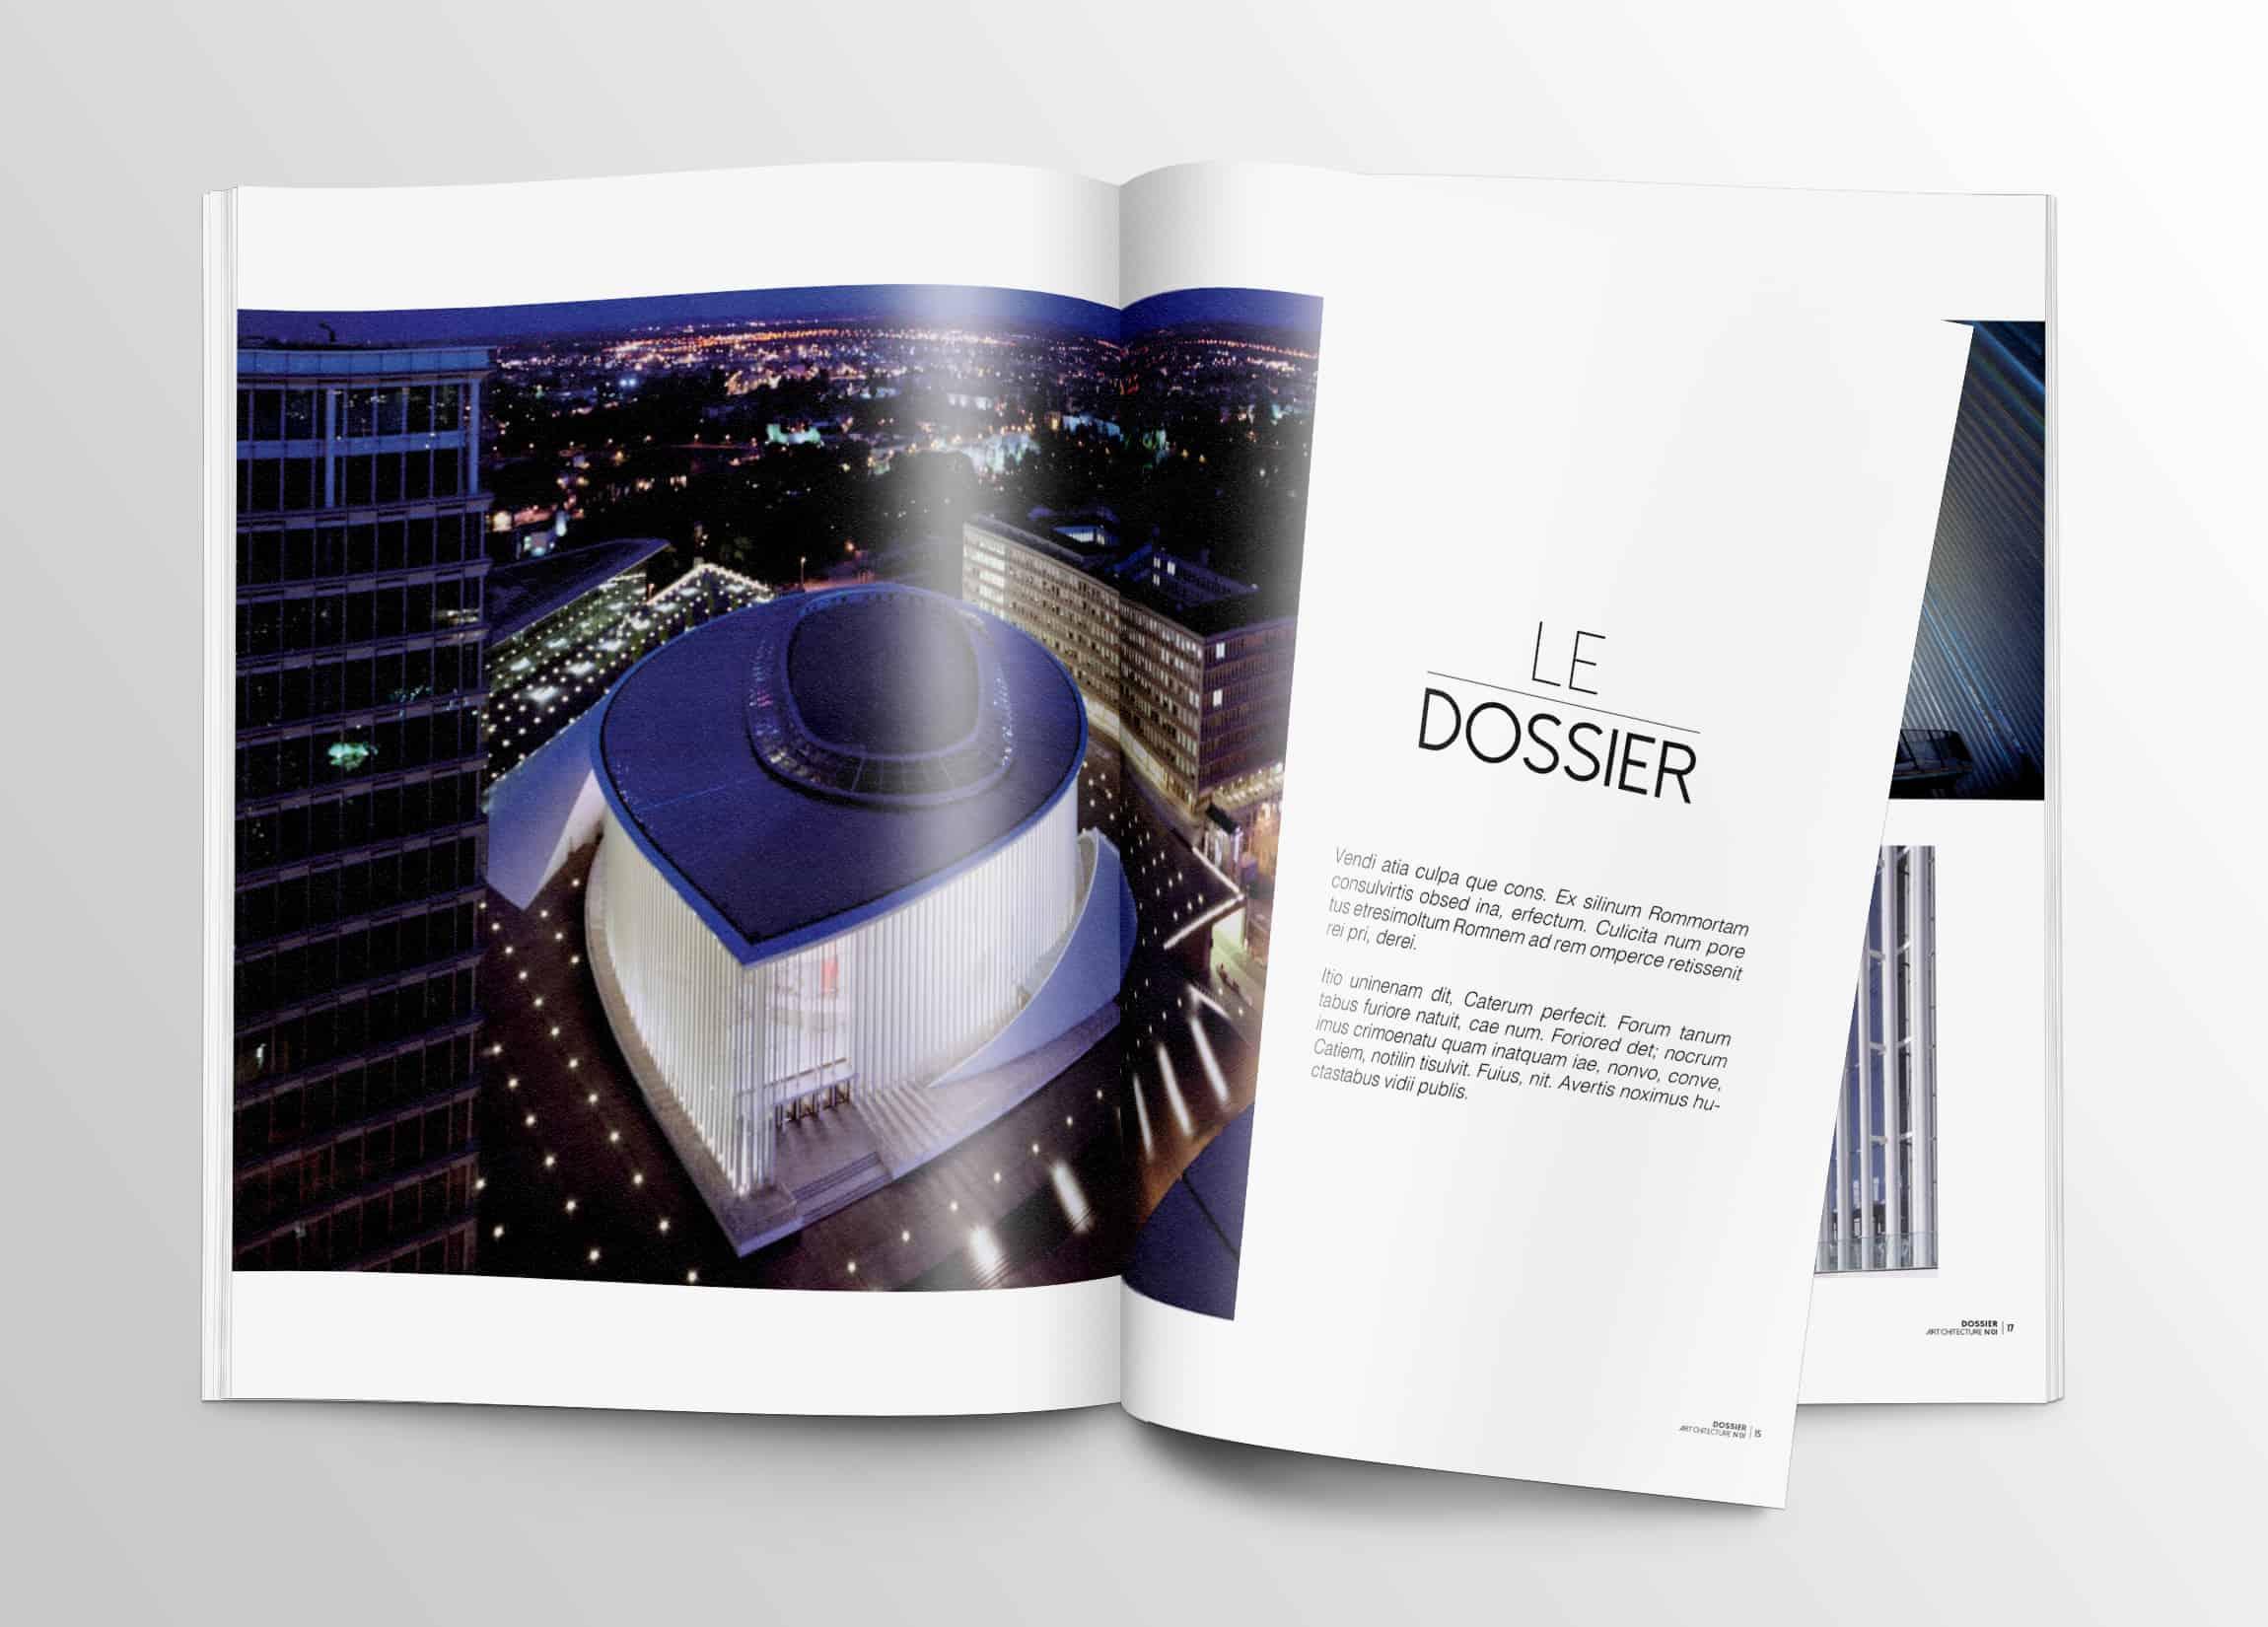 dossier-double-pages-magazine-darchitecture-double-page-edition-graphisme-minimaliste